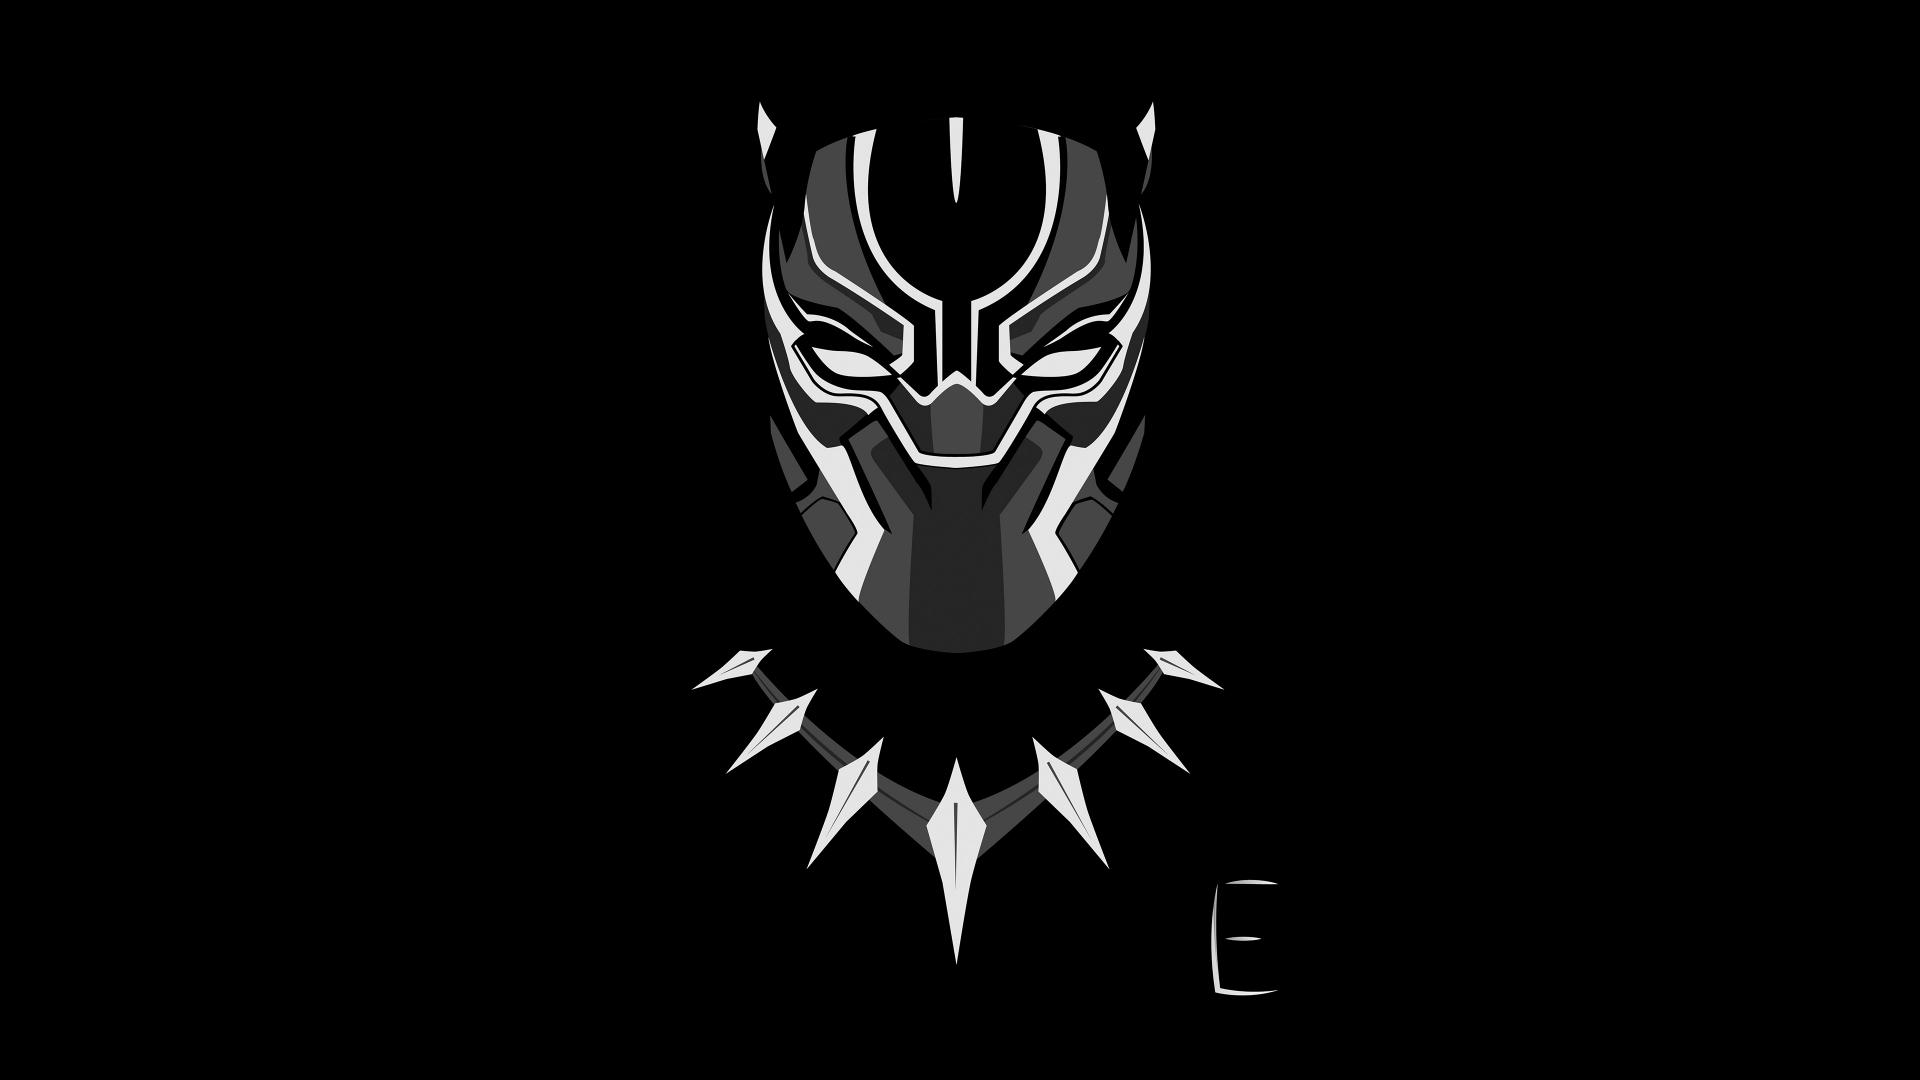 Download 1920x1080 wallpaper black panther face minimal for Minimal art face